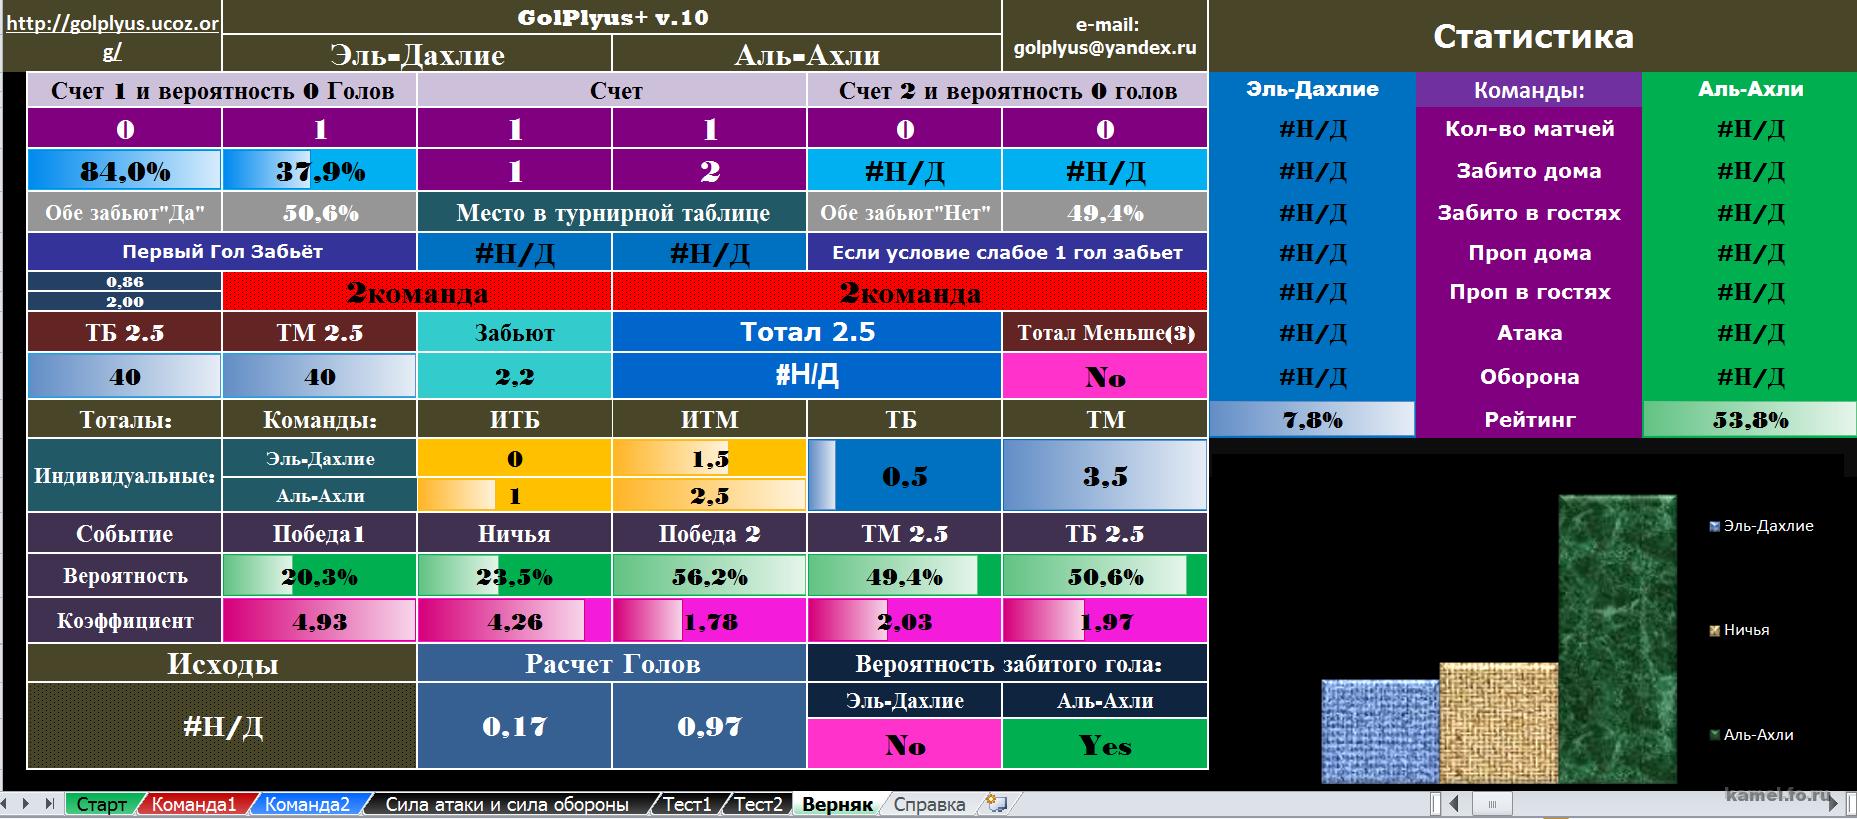 Программа Golplyus v10.1